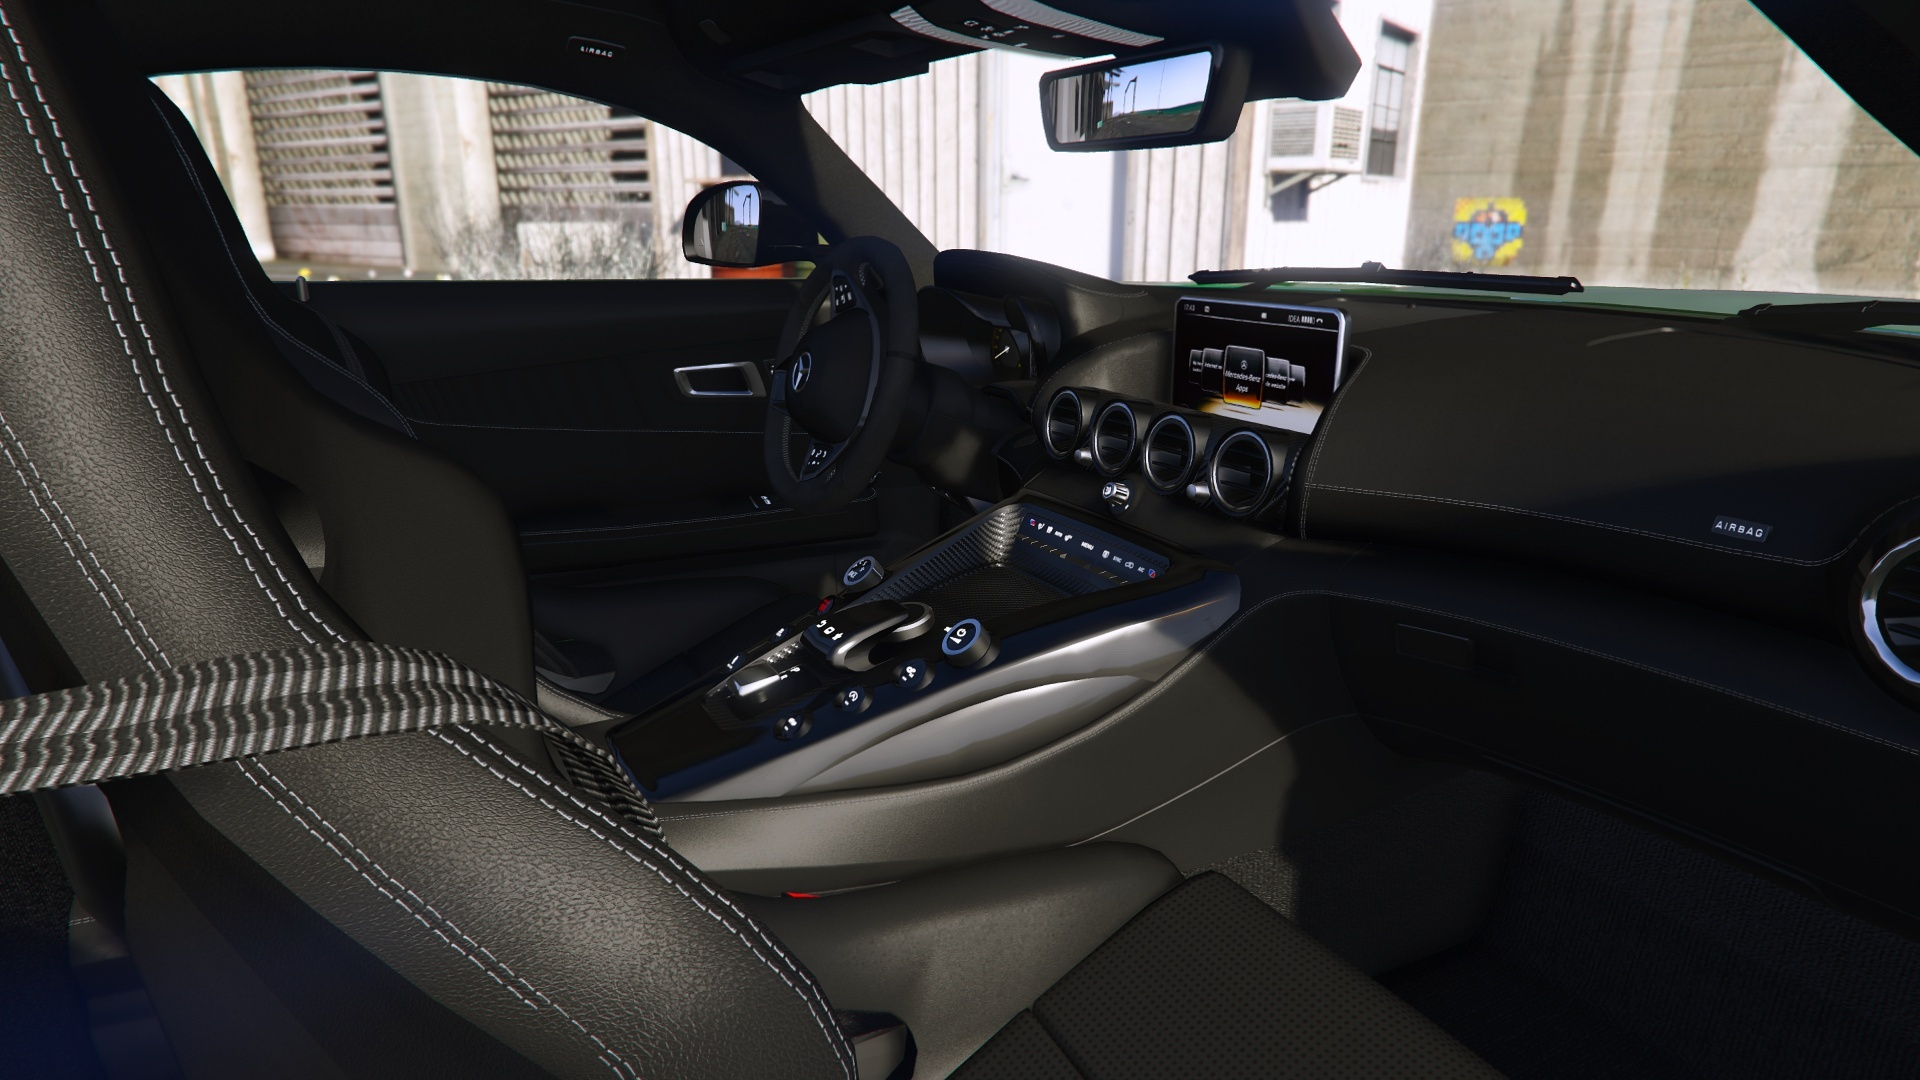 Gran Turismo Mod - Real Simulation Handling for BMW M6 E63